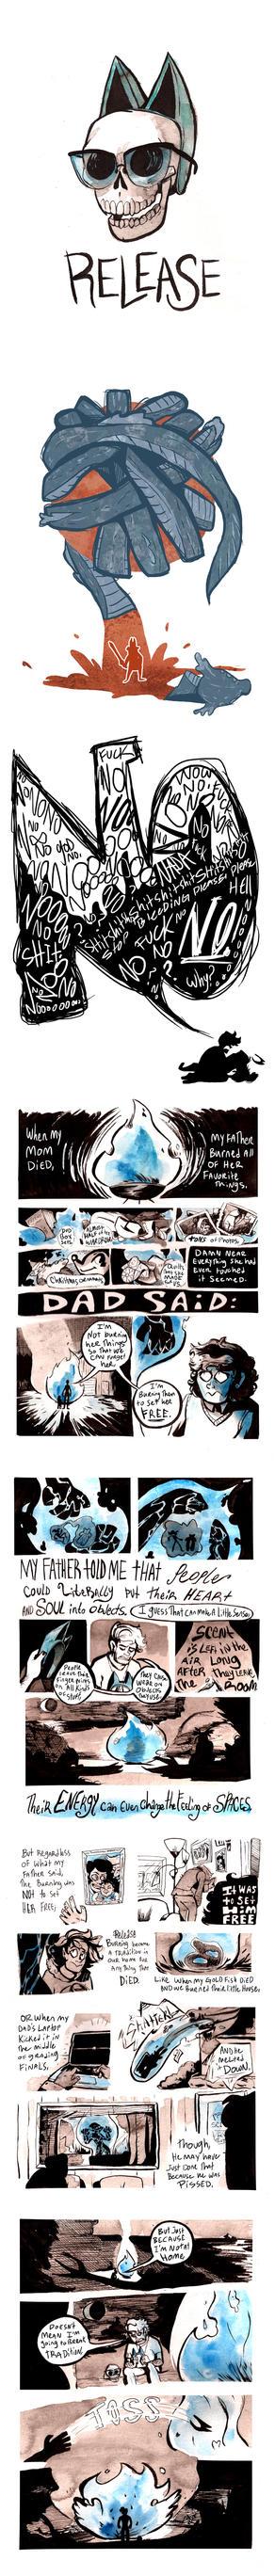 Significant Event Comic by jocosejoni